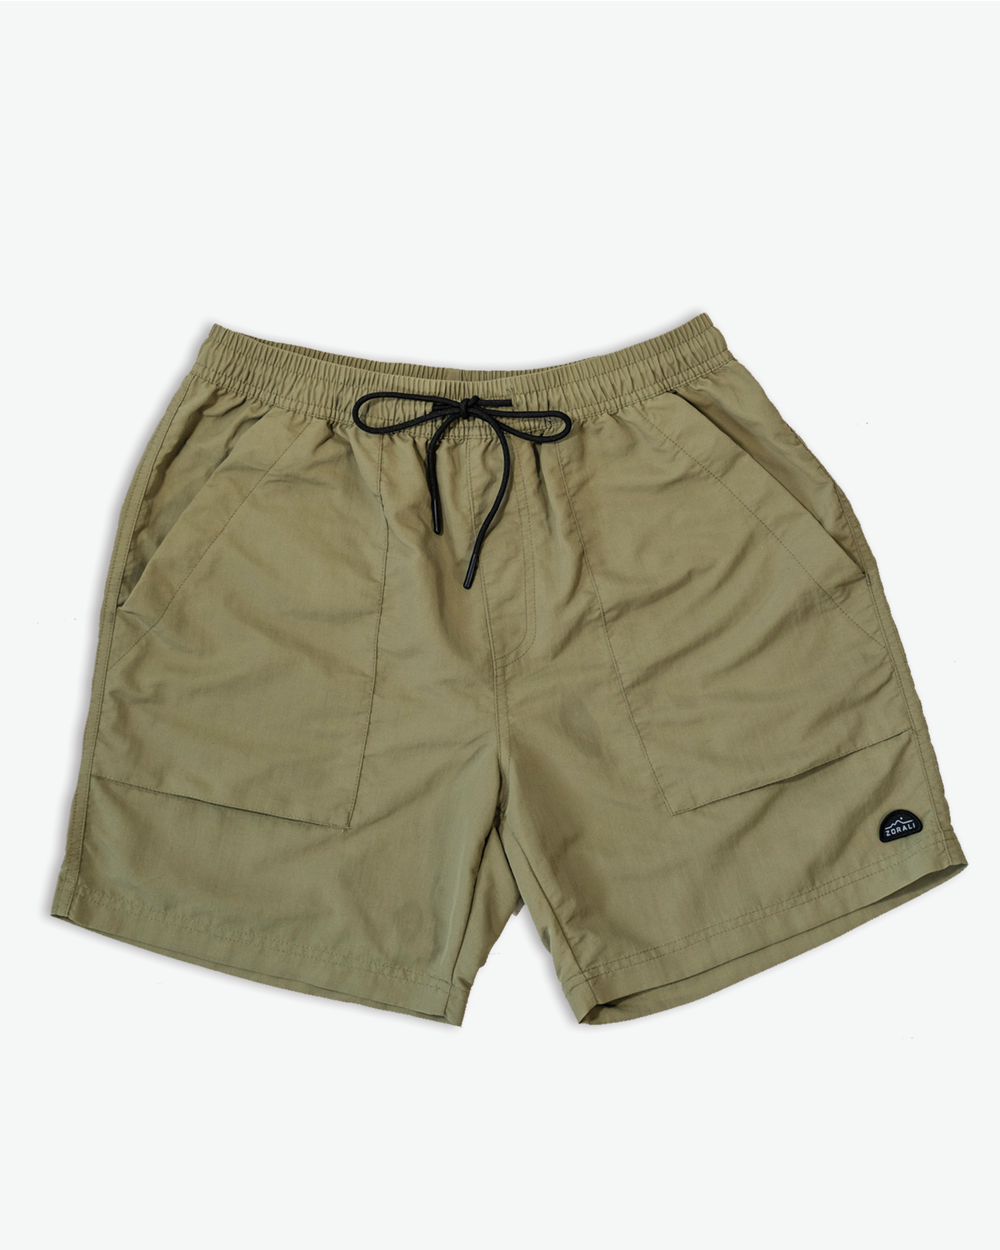 Zorali-Venture-Shorts-Olive-2.png